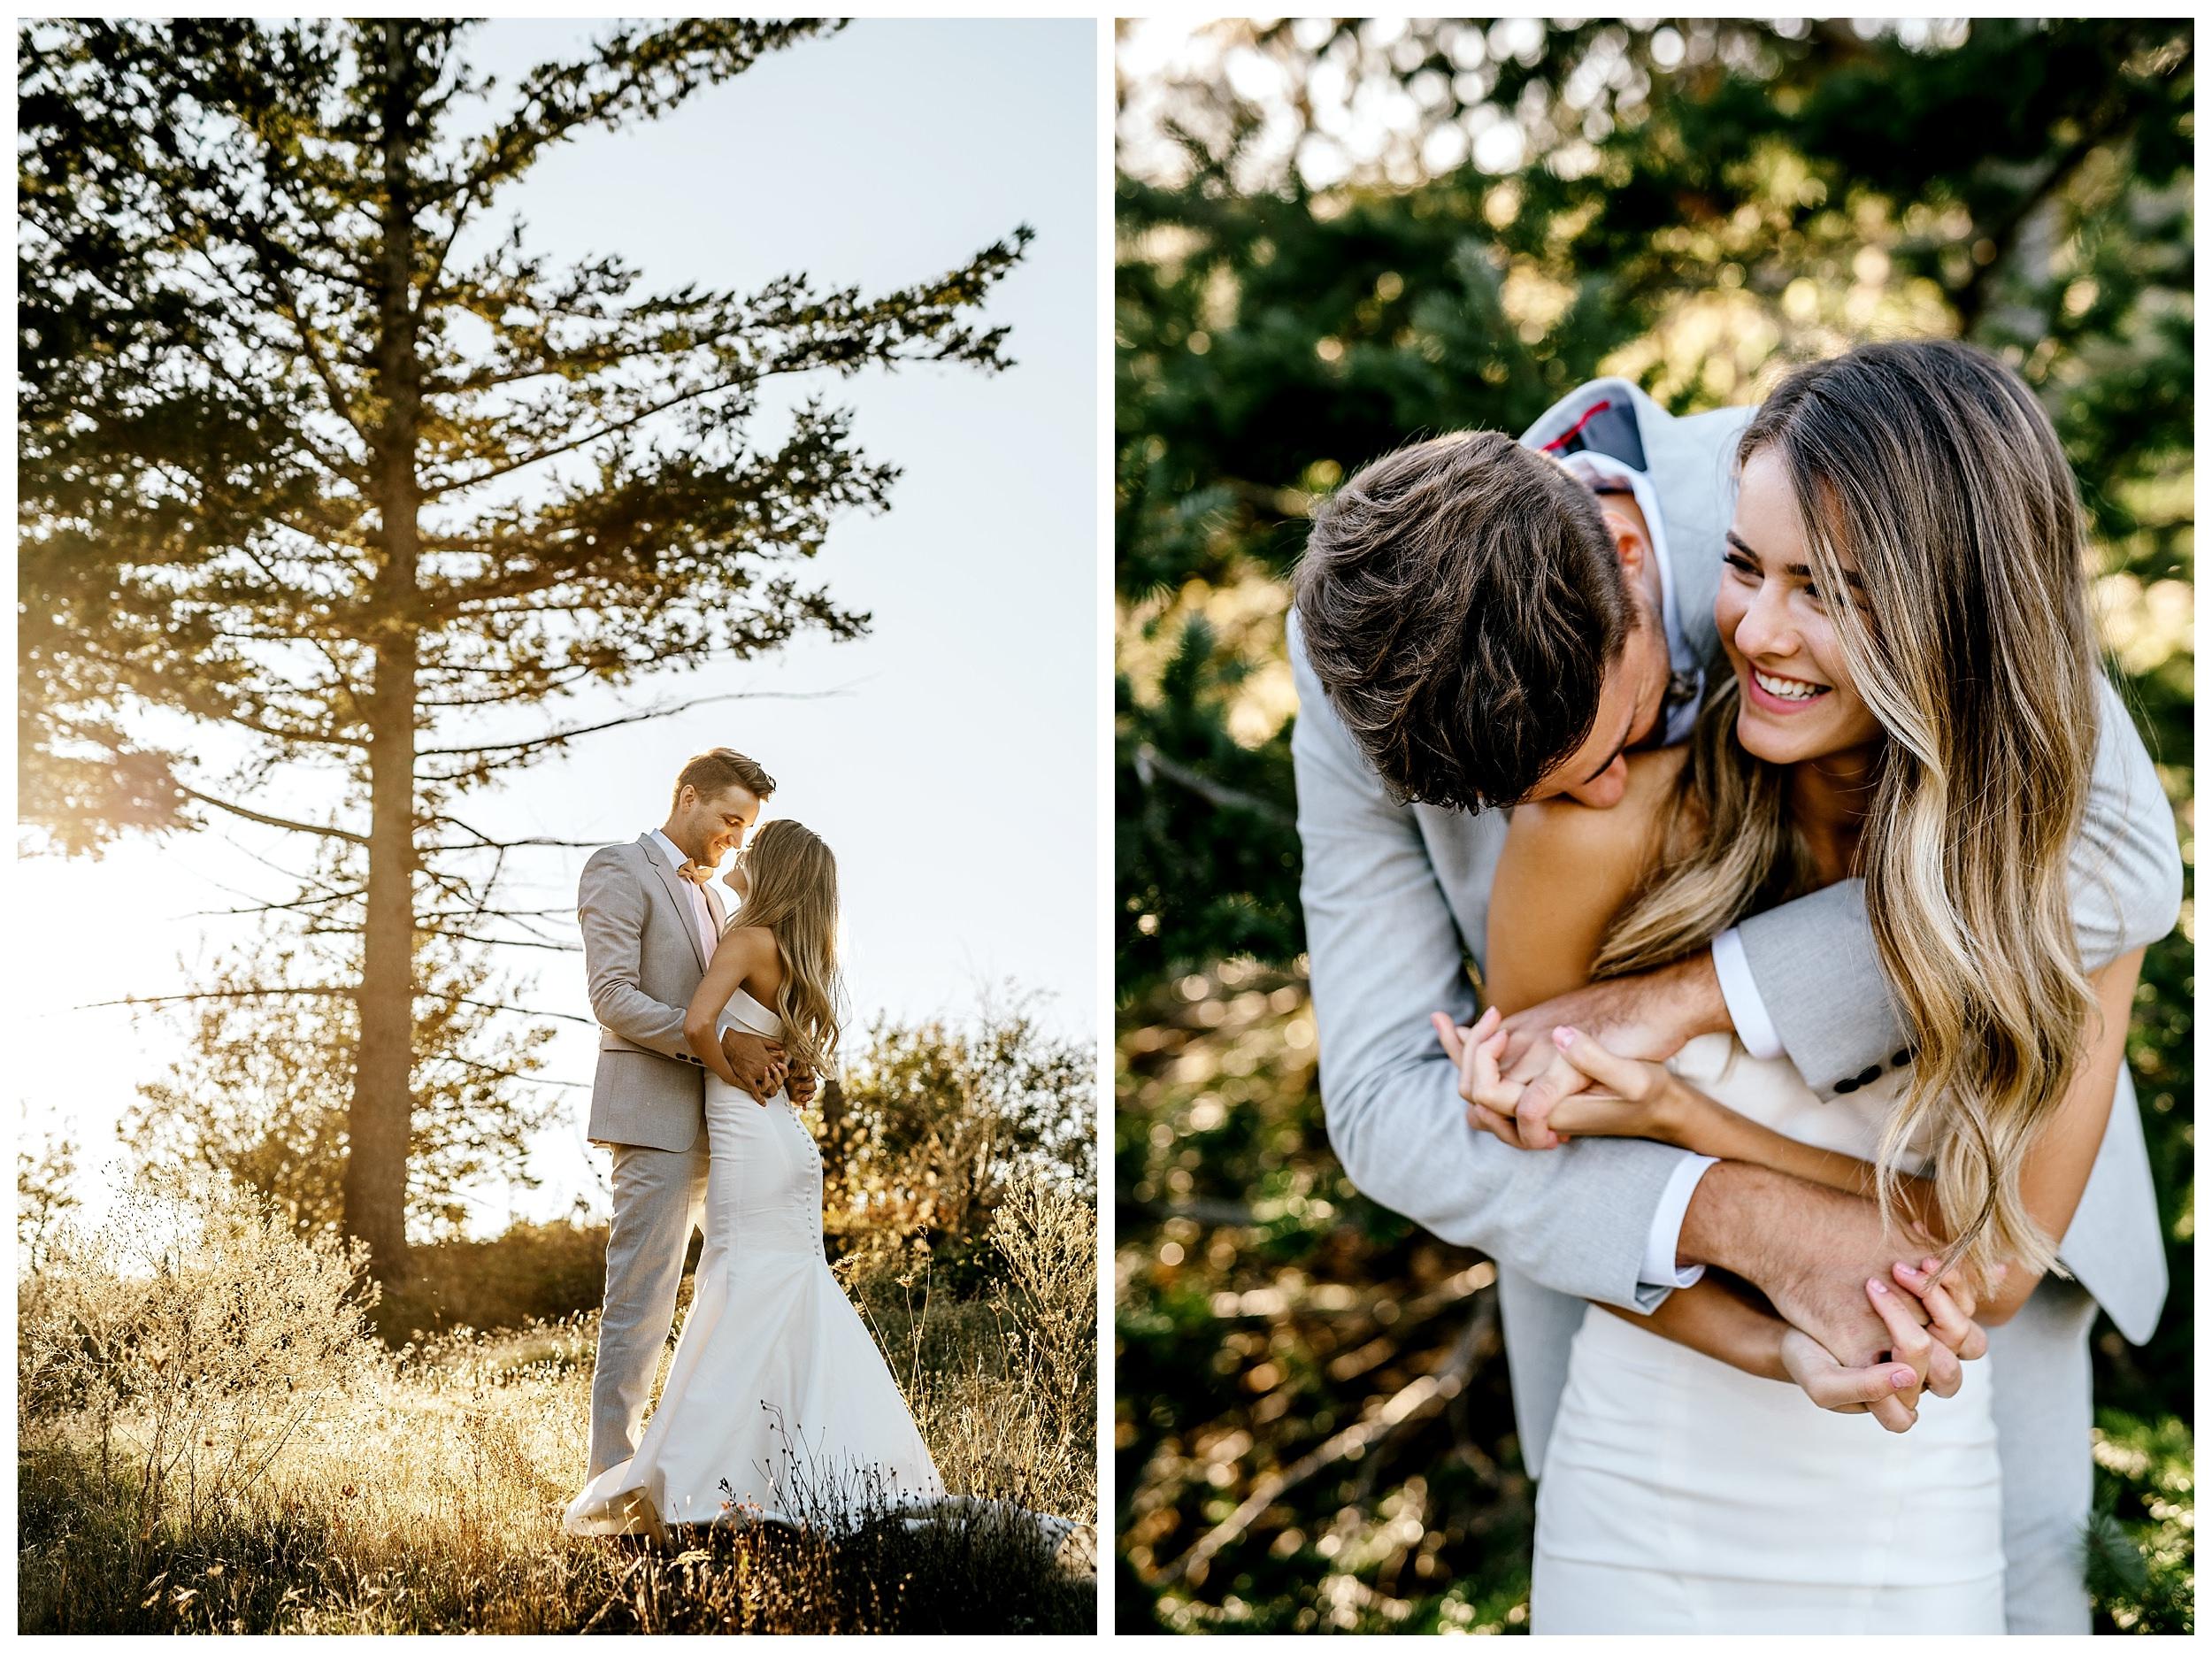 Portland-Wedding-Photographer-Columbia-River-Gorge-elopement04.jpg